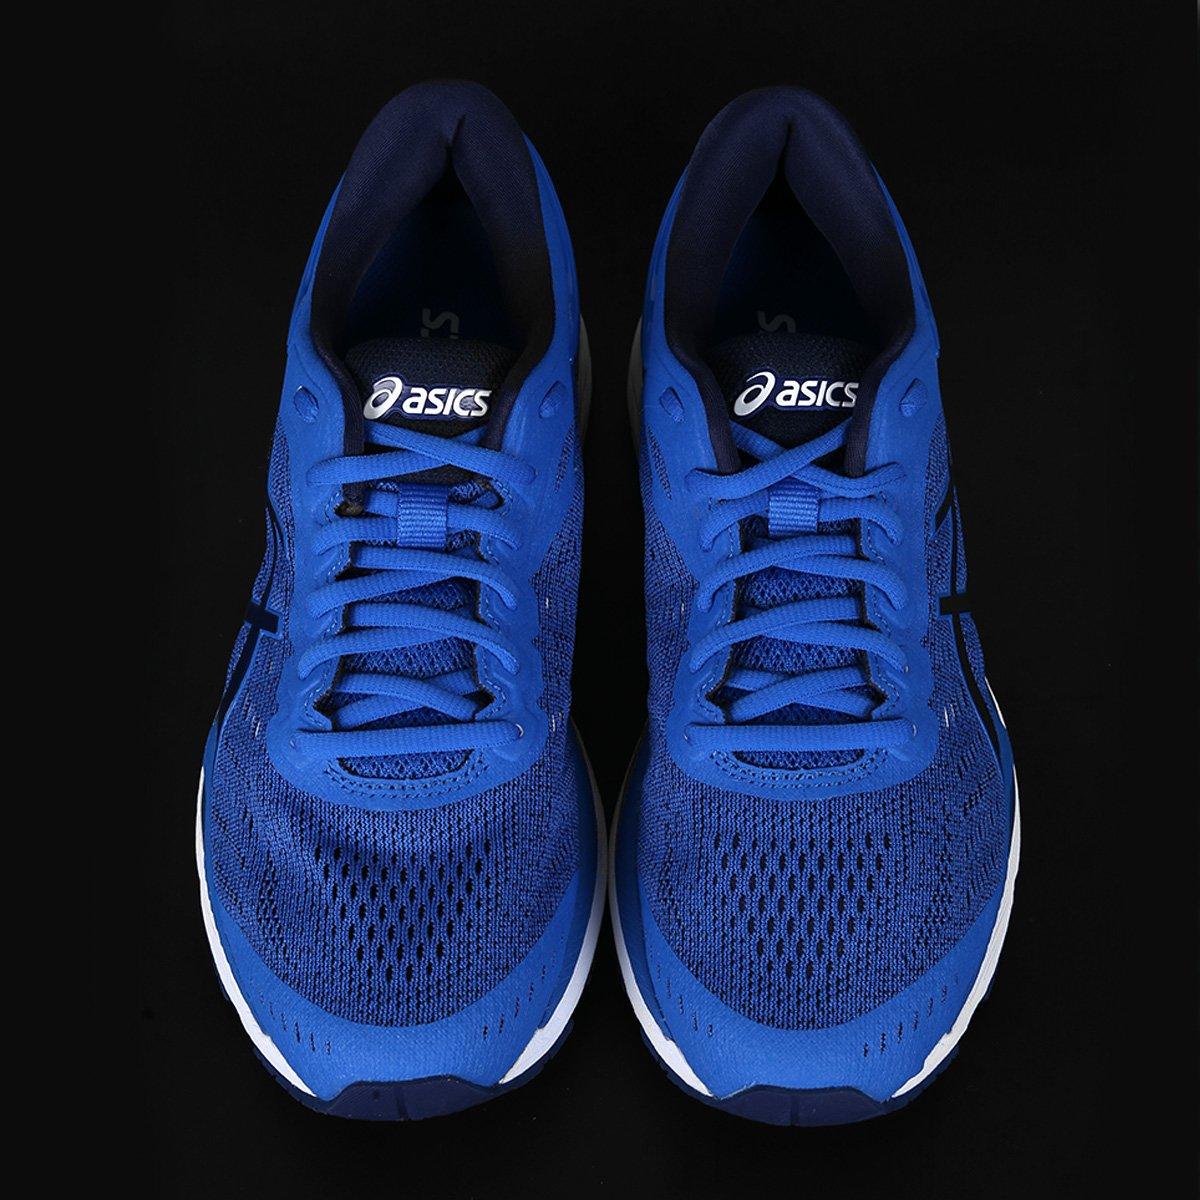 Tênis Asics Gel-Kayano 24 Masculino - Azul e Preto - Compre Agora ... ed29a50661ae9